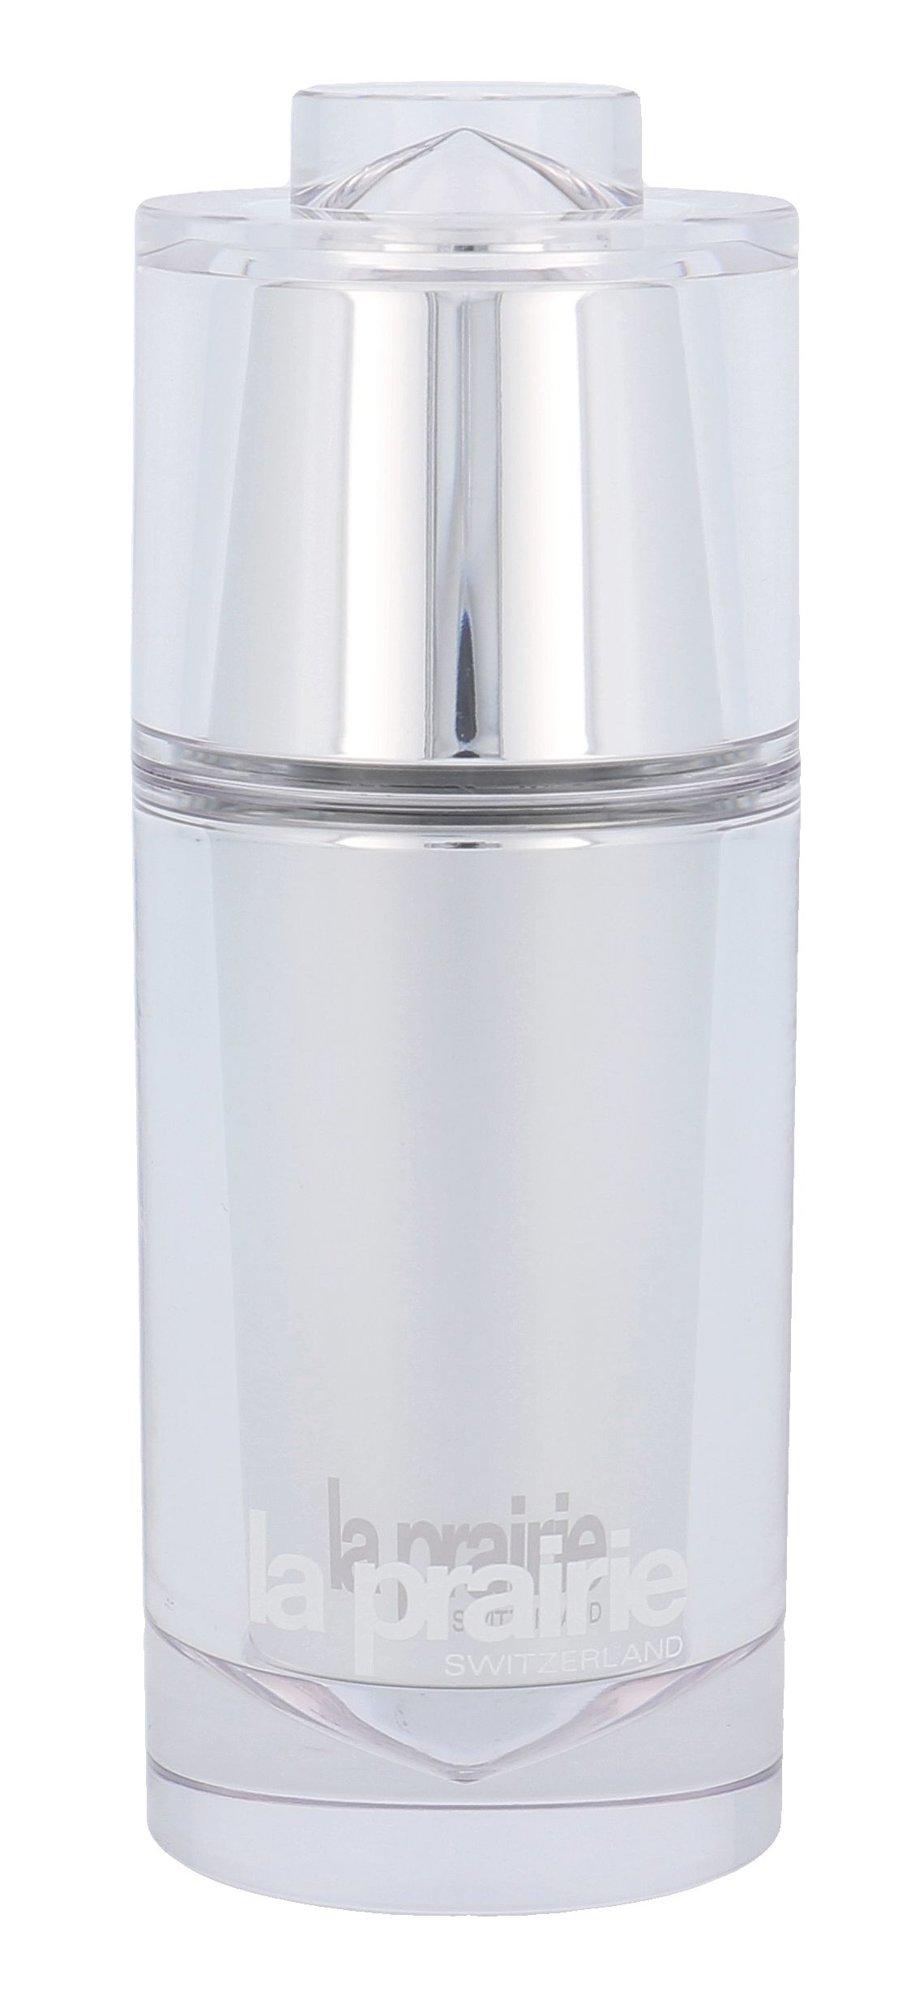 La Prairie Cellular Eye Essence Platinum Rare Cosmetic 15ml